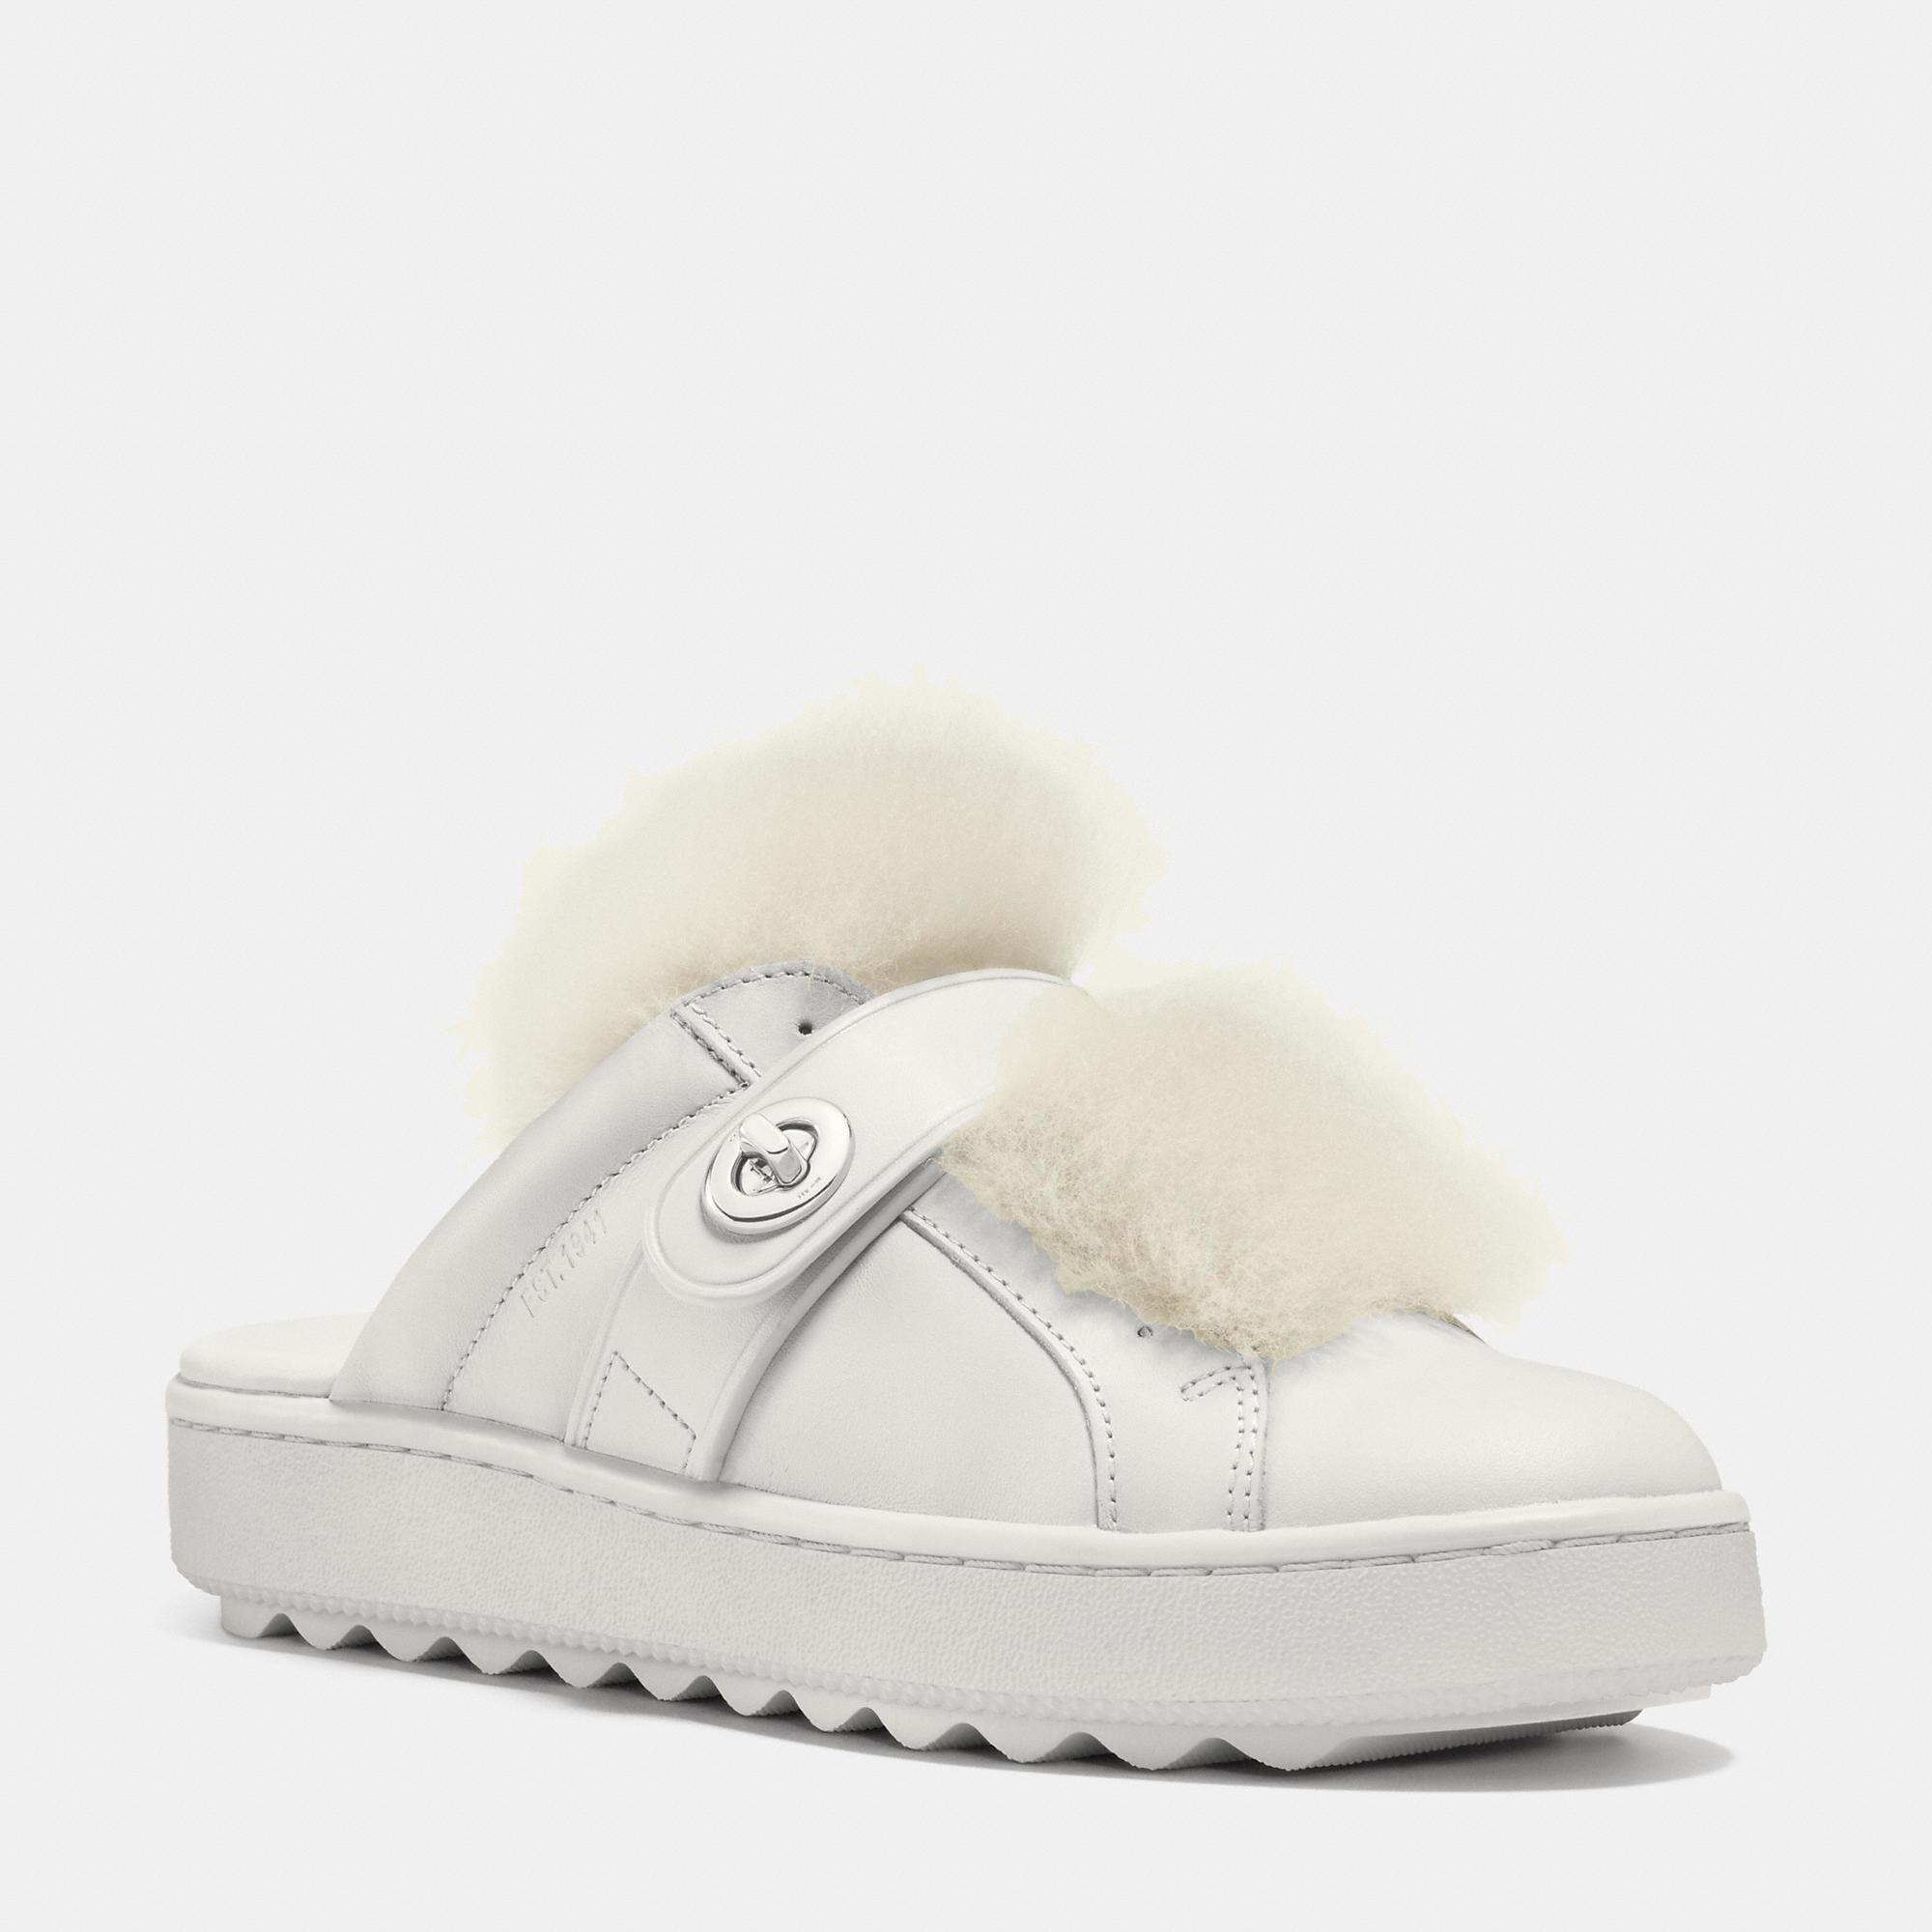 2b6e2841637 Lyst - COACH Lo Top Slide Sneaker in Natural